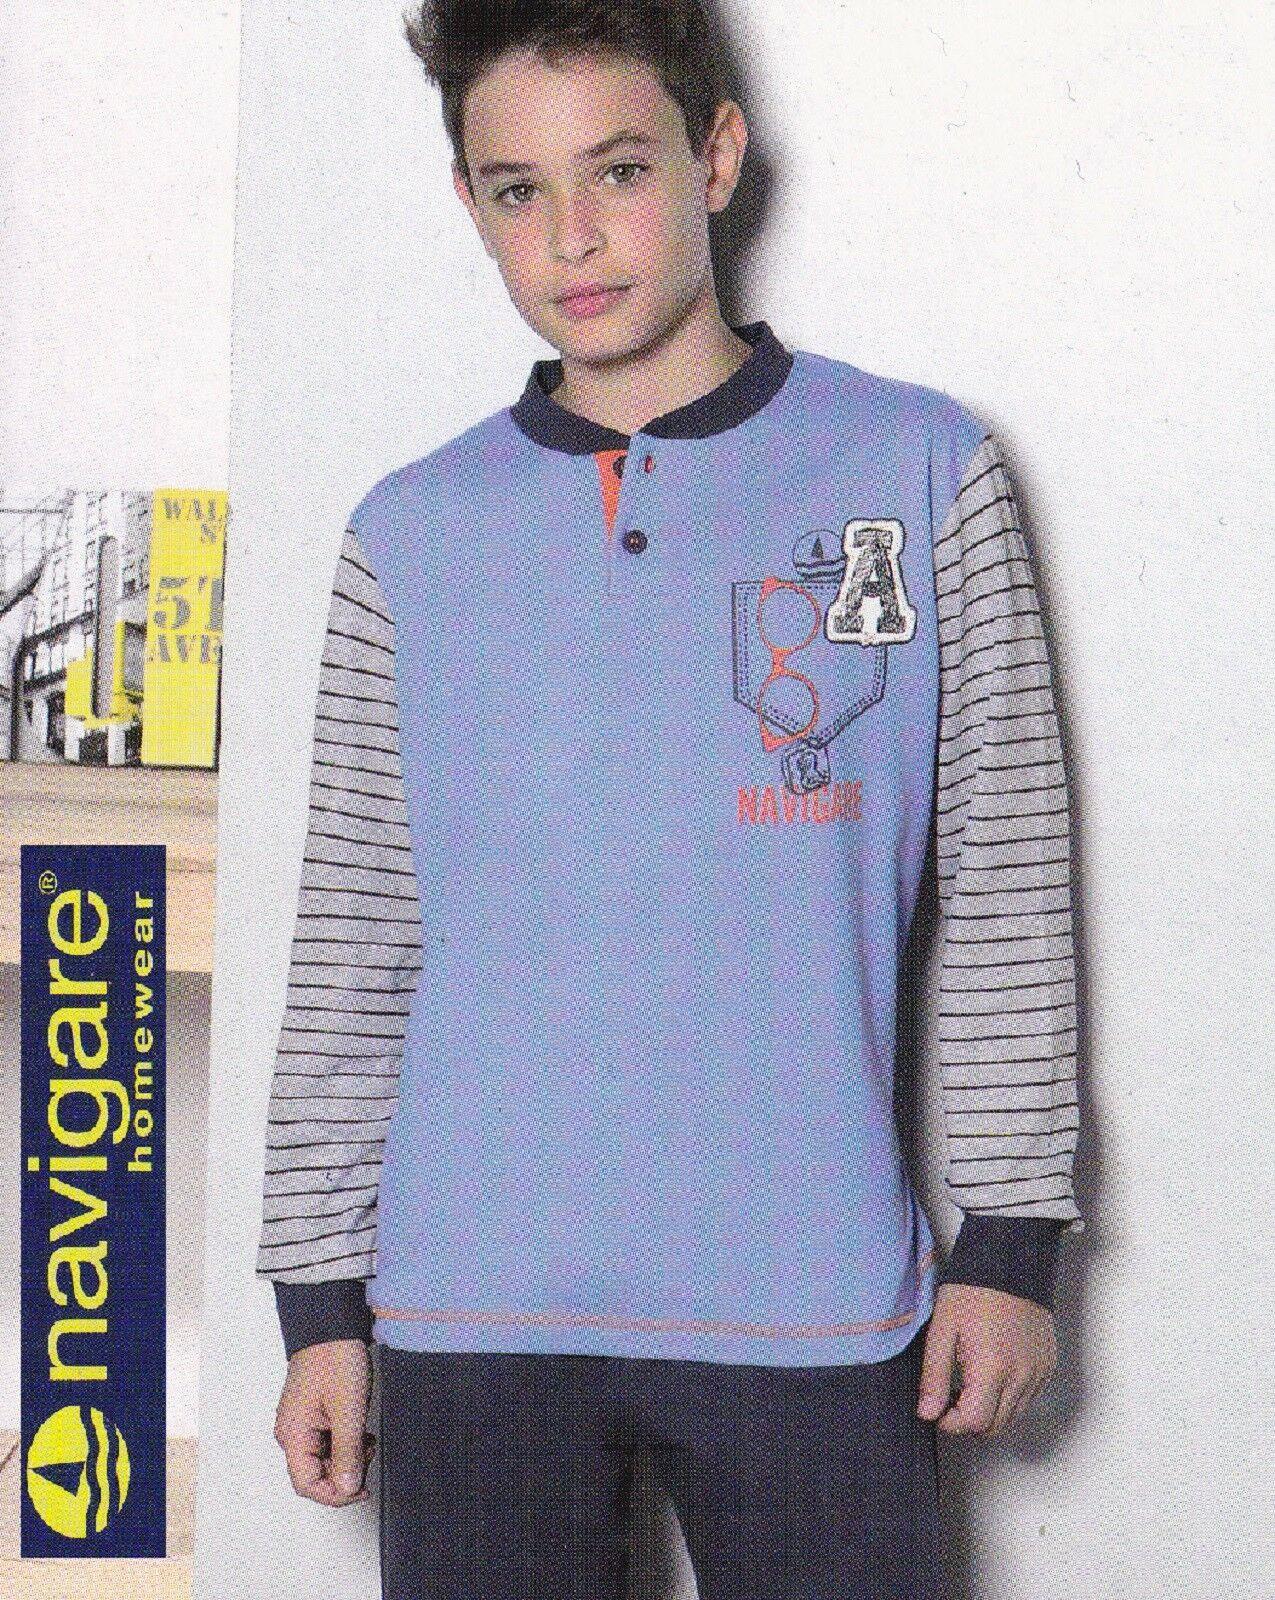 Pigiama Ragazzo Cotone Jersey, Pantalone + Manica lunga. NAVIGARE homewear 15418